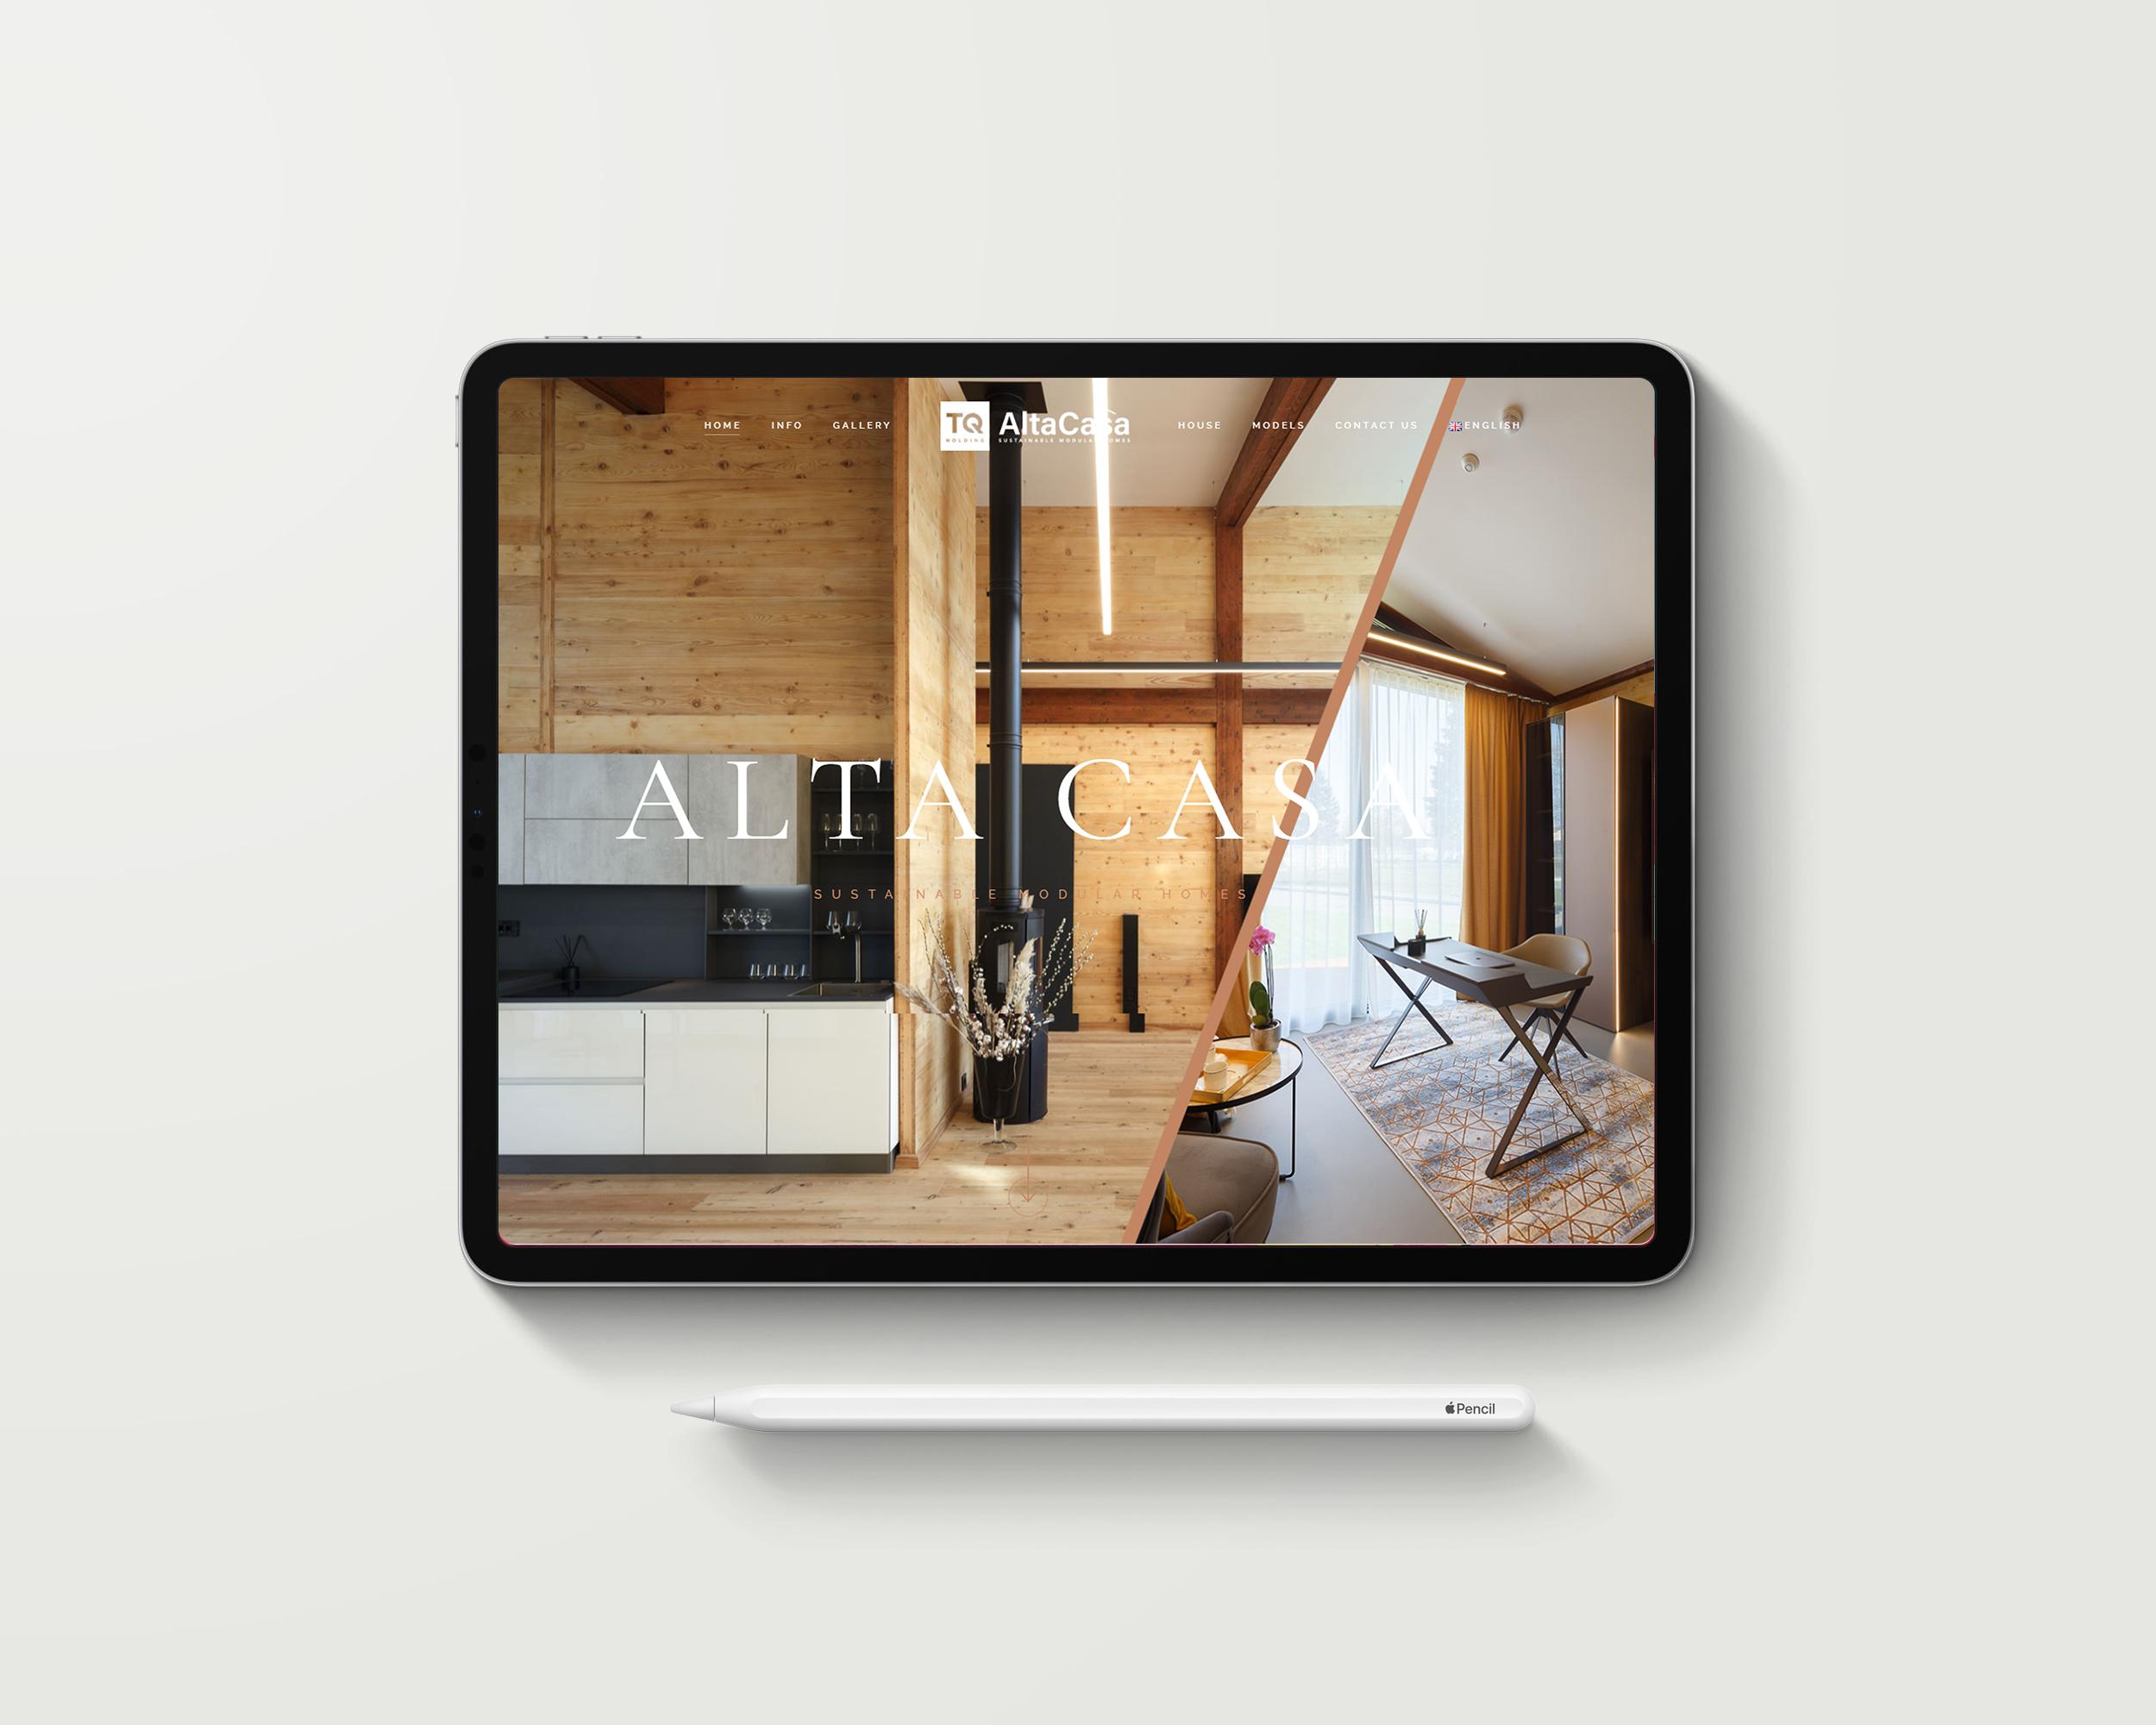 http://newform.media/wp-content/uploads/2021/01/iPad-Pro-2019-Mockup.jpg